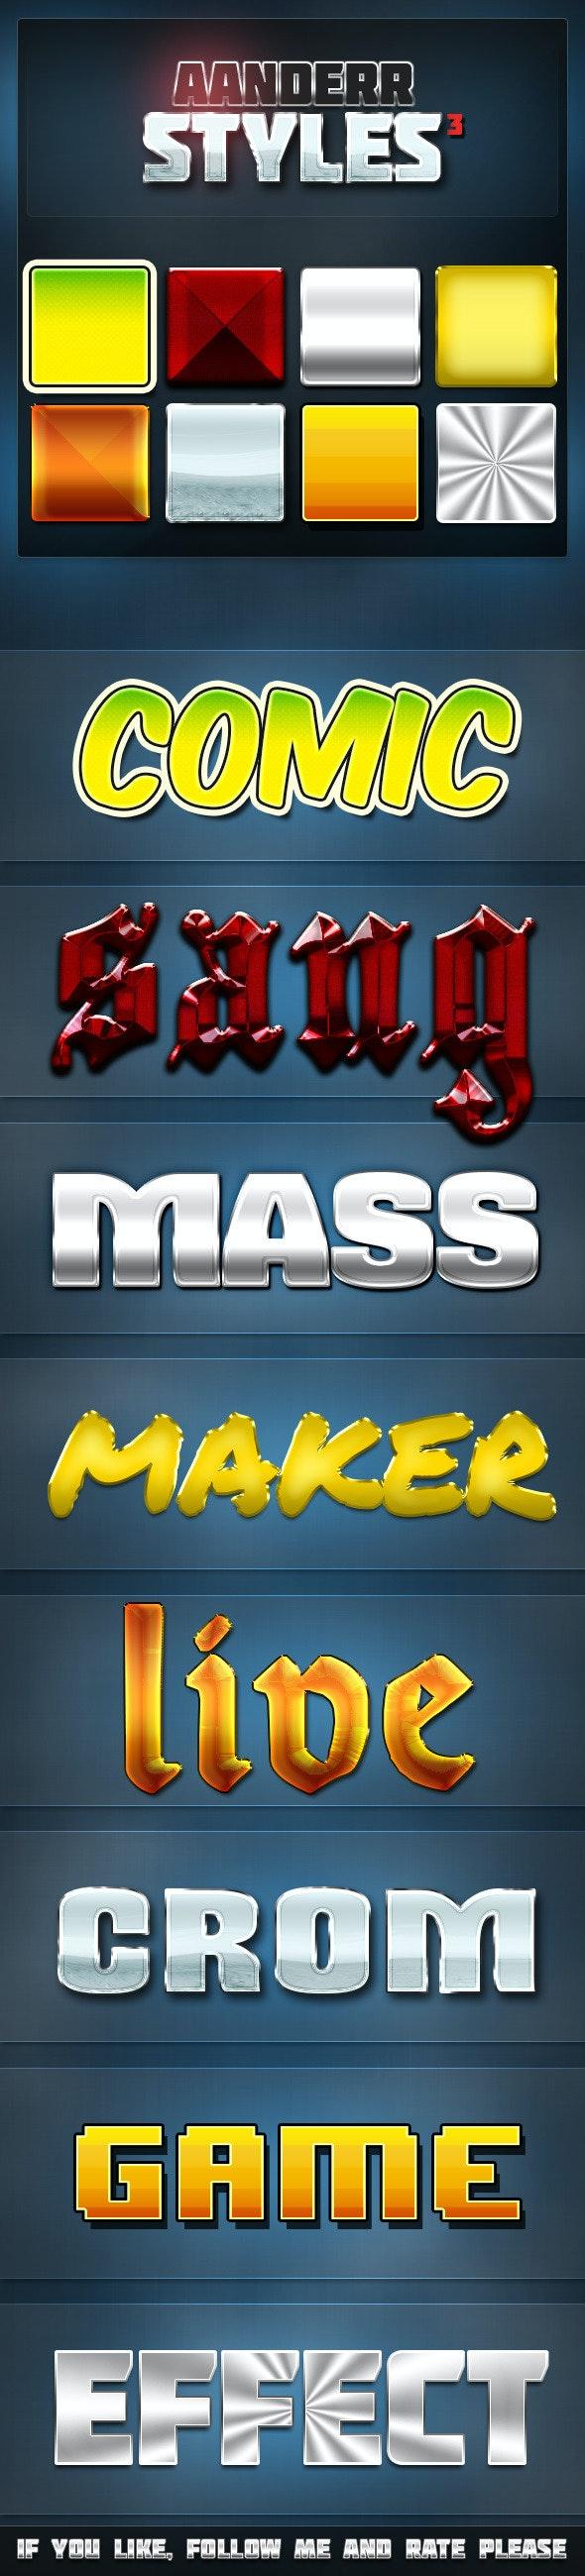 Aanderr Styles 3 - Styles Photoshop